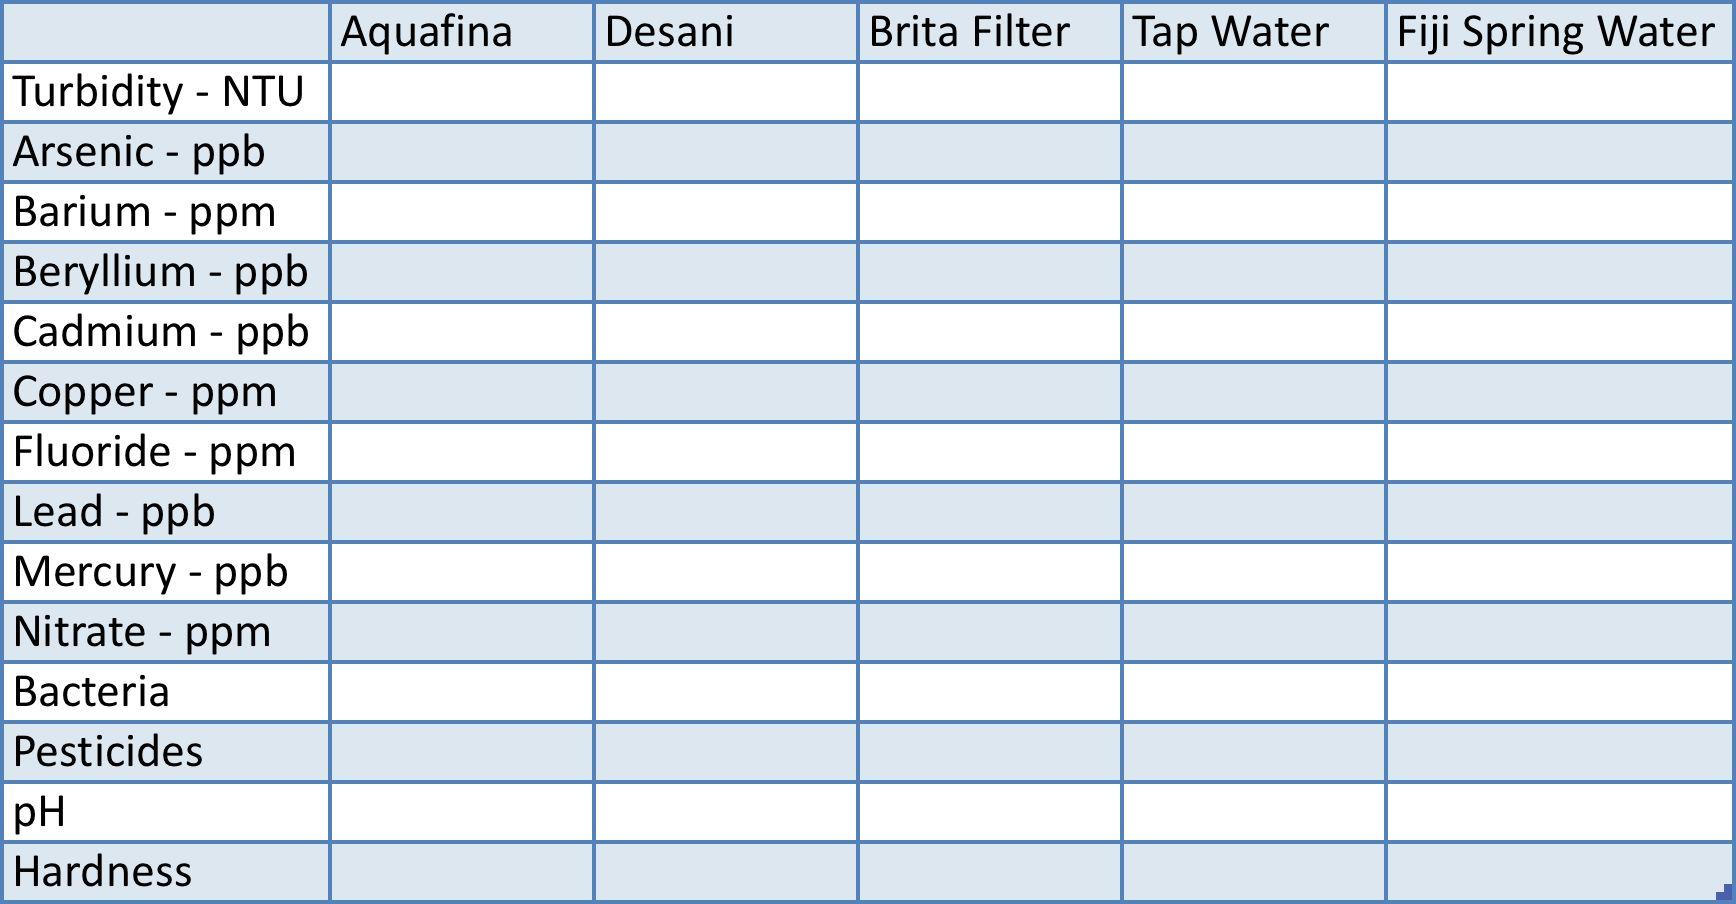 bottled water ratings